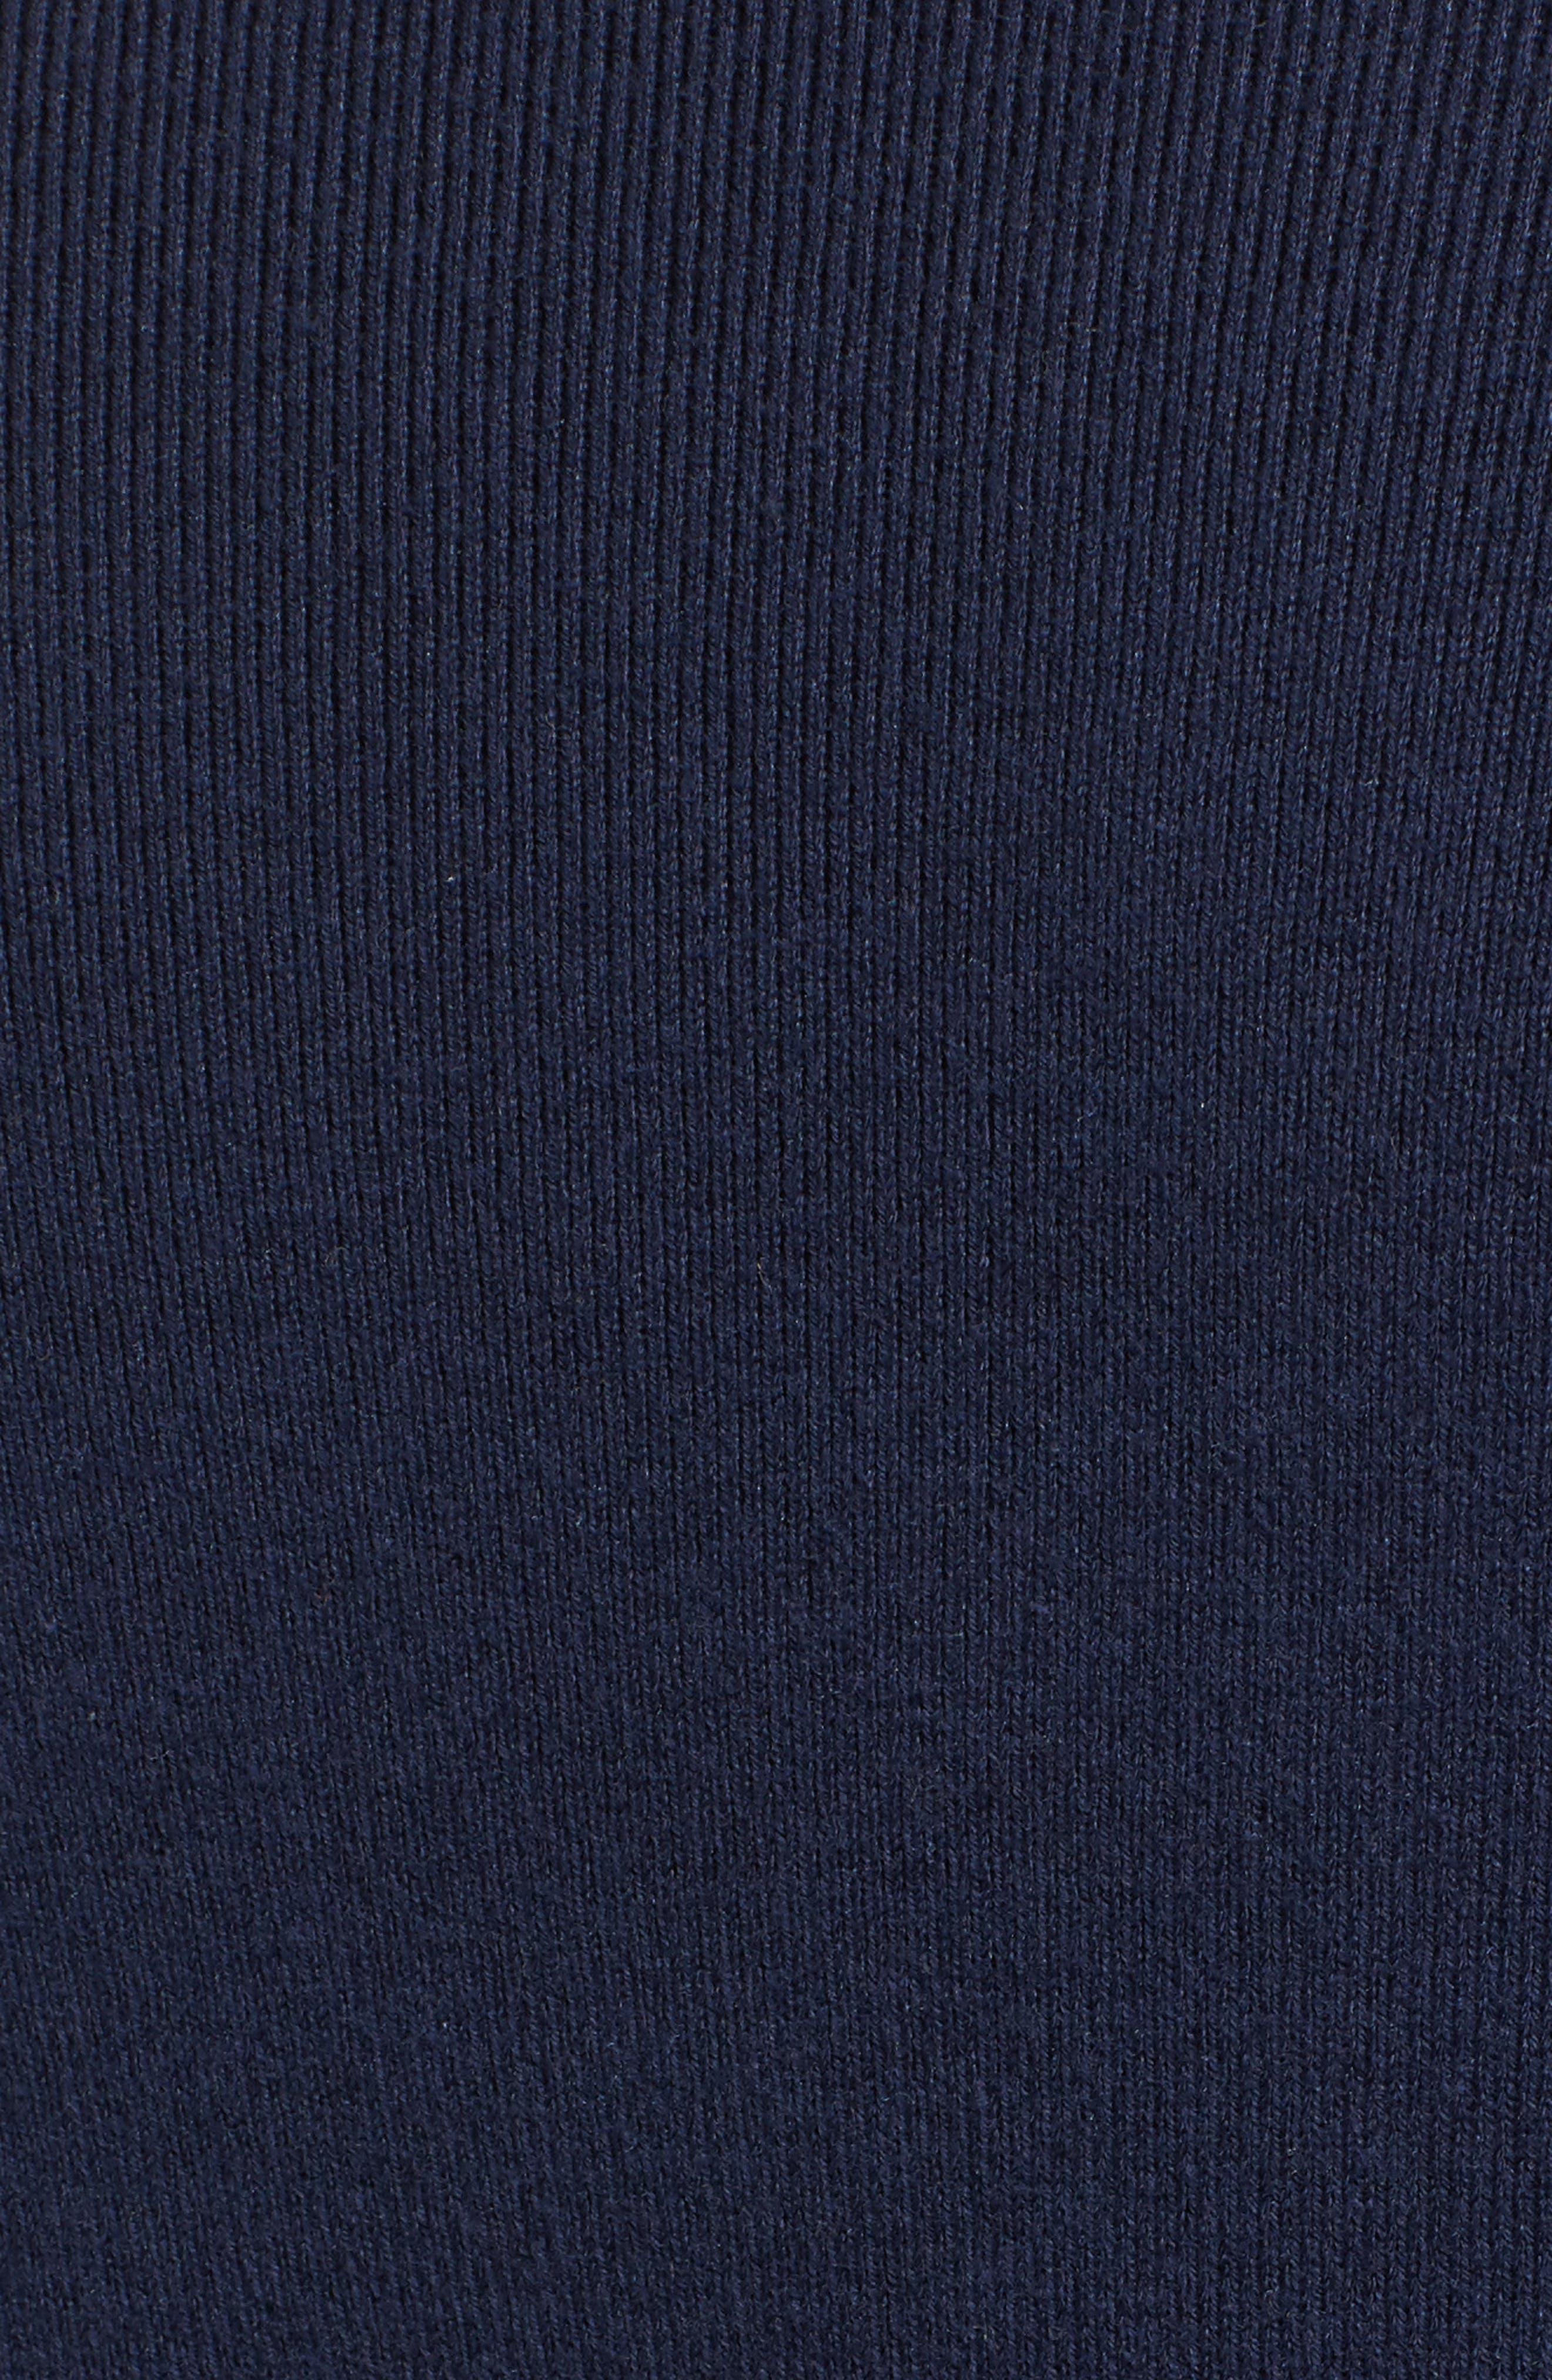 Flare Sleeve Sweater,                             Alternate thumbnail 6, color,                             Navy Peacoat